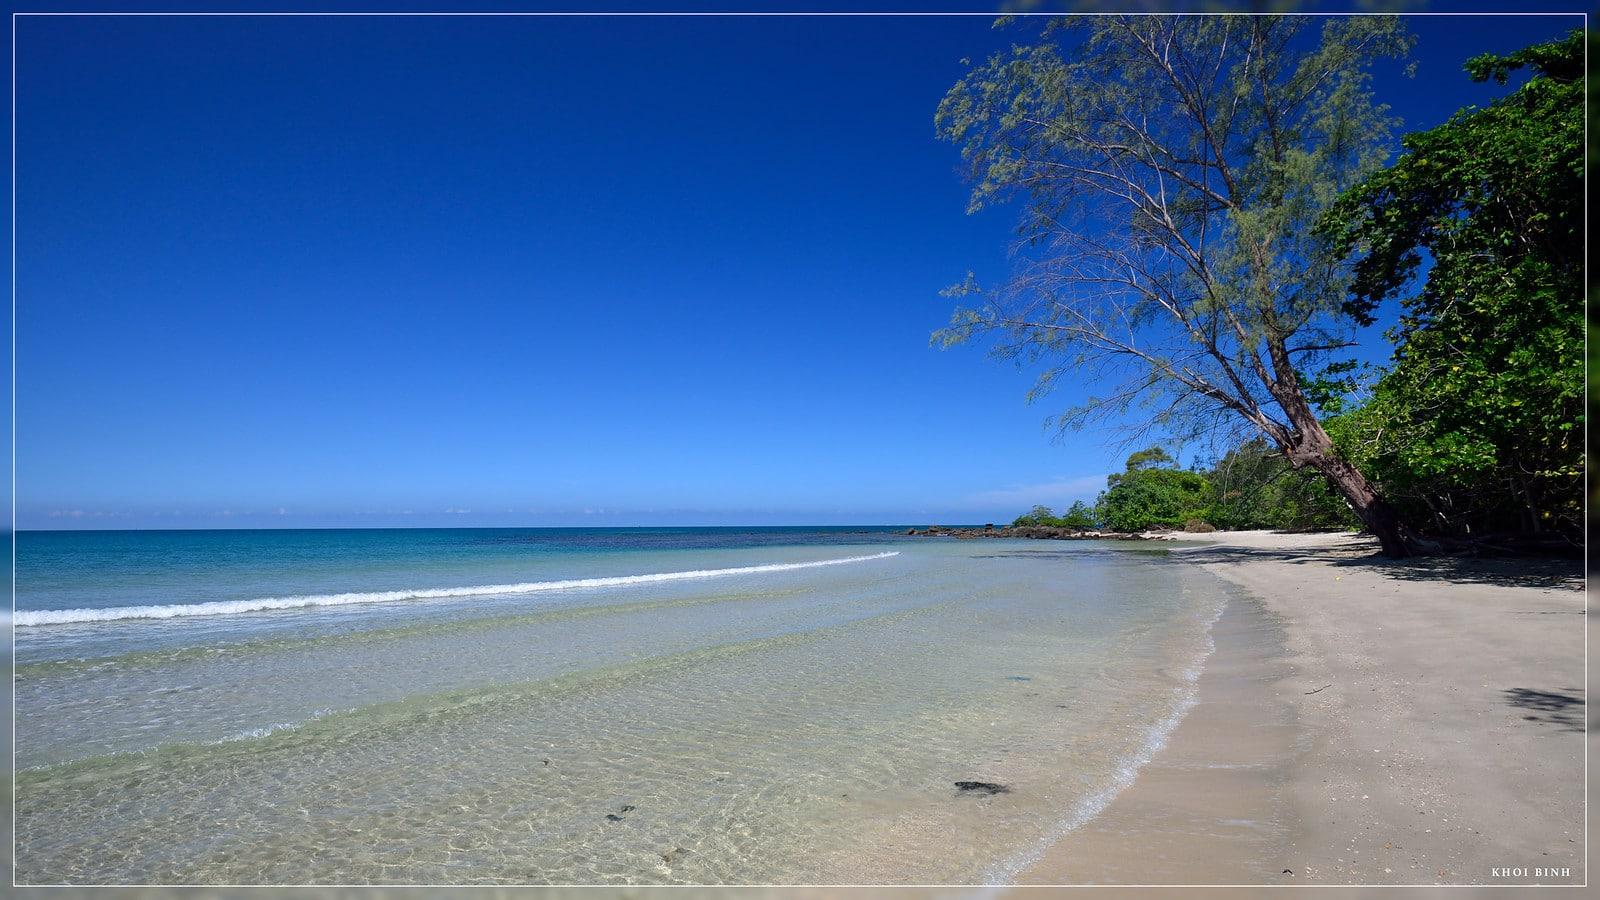 Remote Beach in Phu Quoc Vietnam